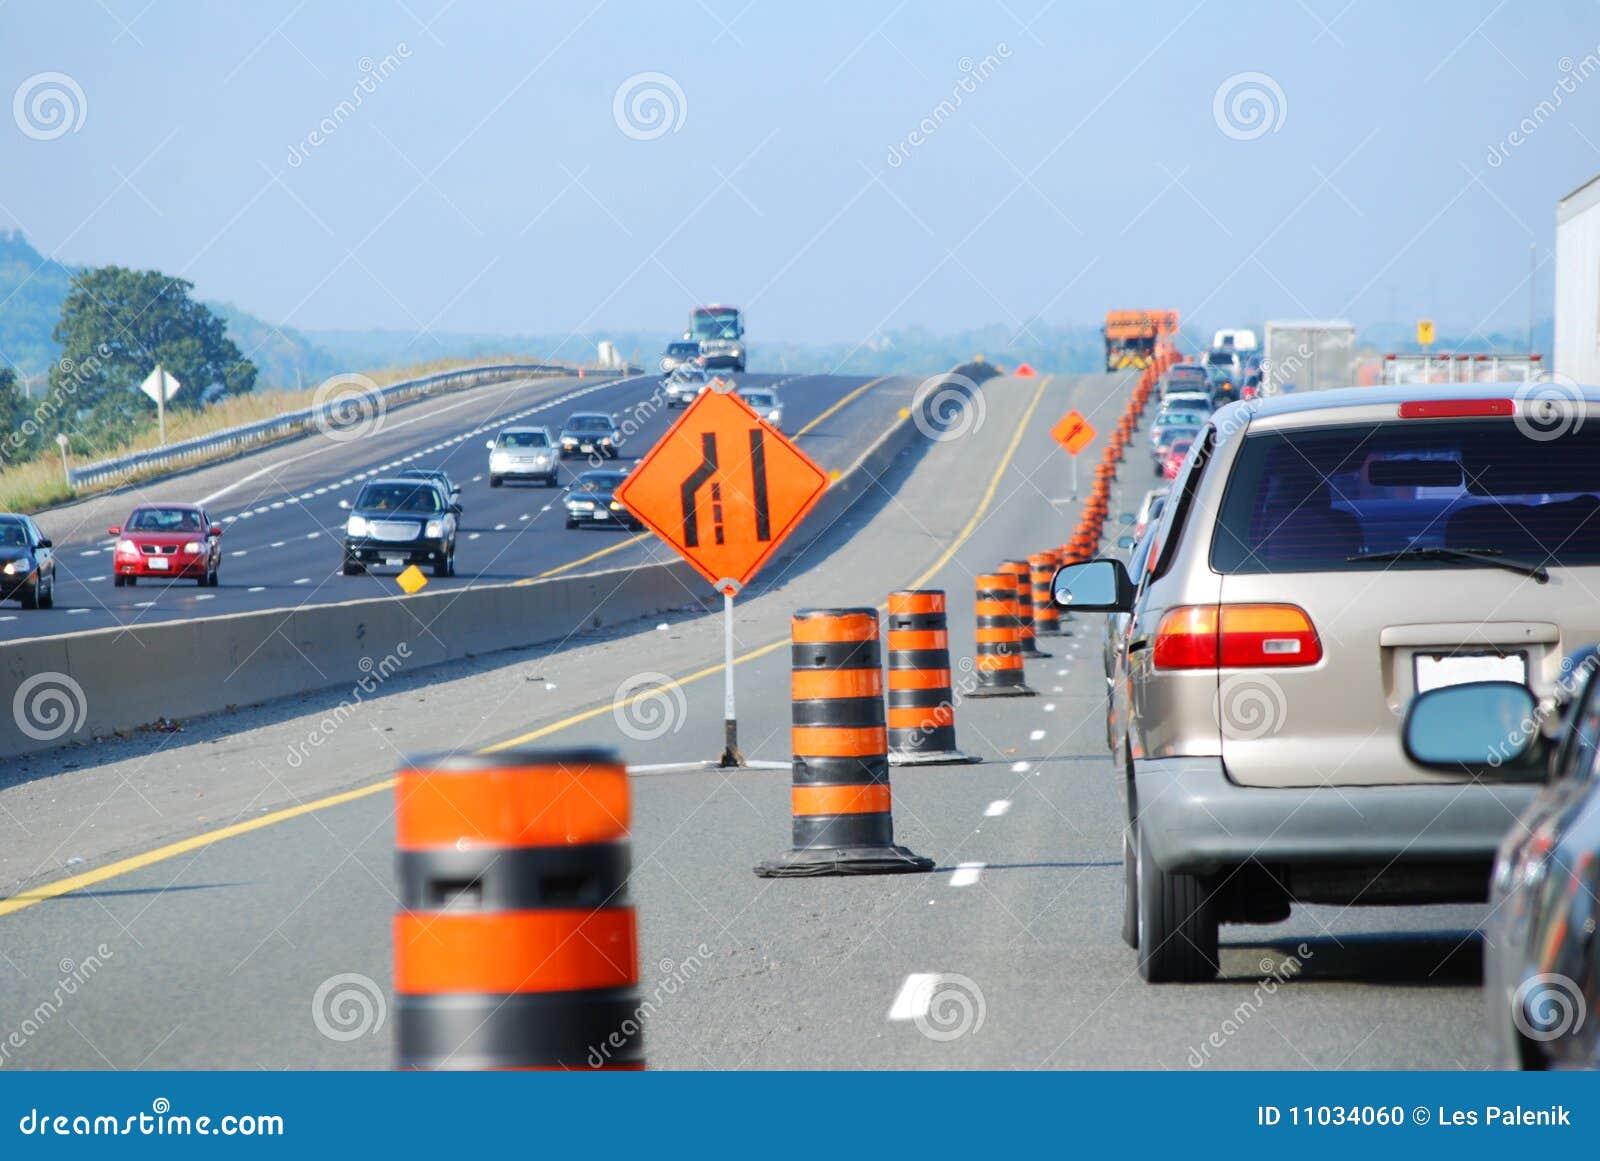 Highway Construction